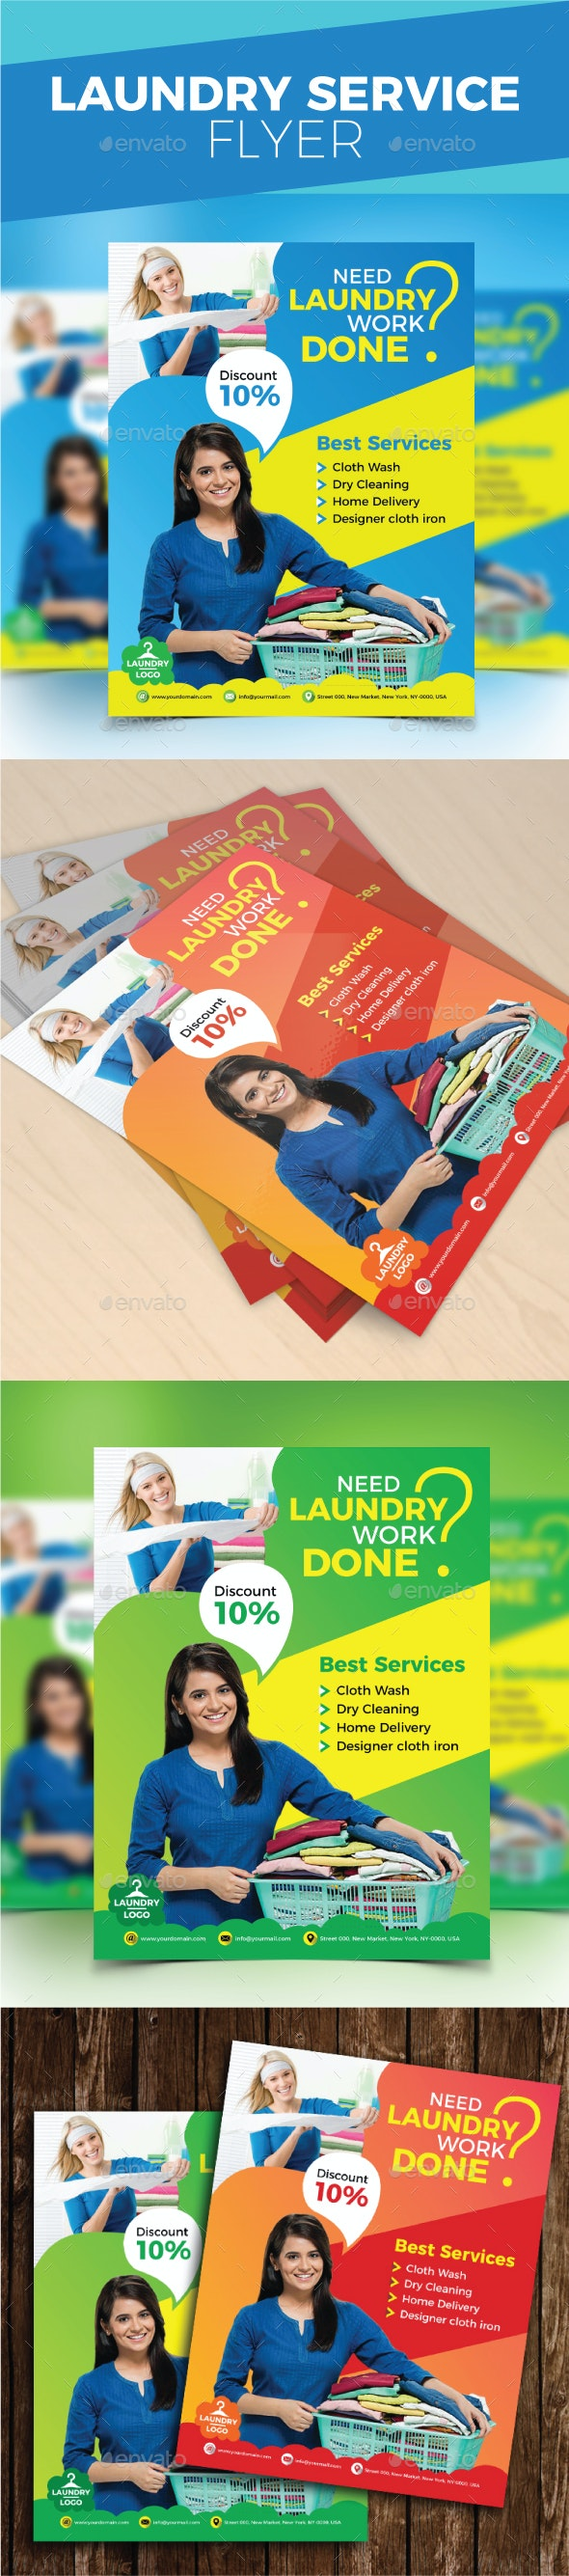 Laundry Service Flyer - Commerce Flyers